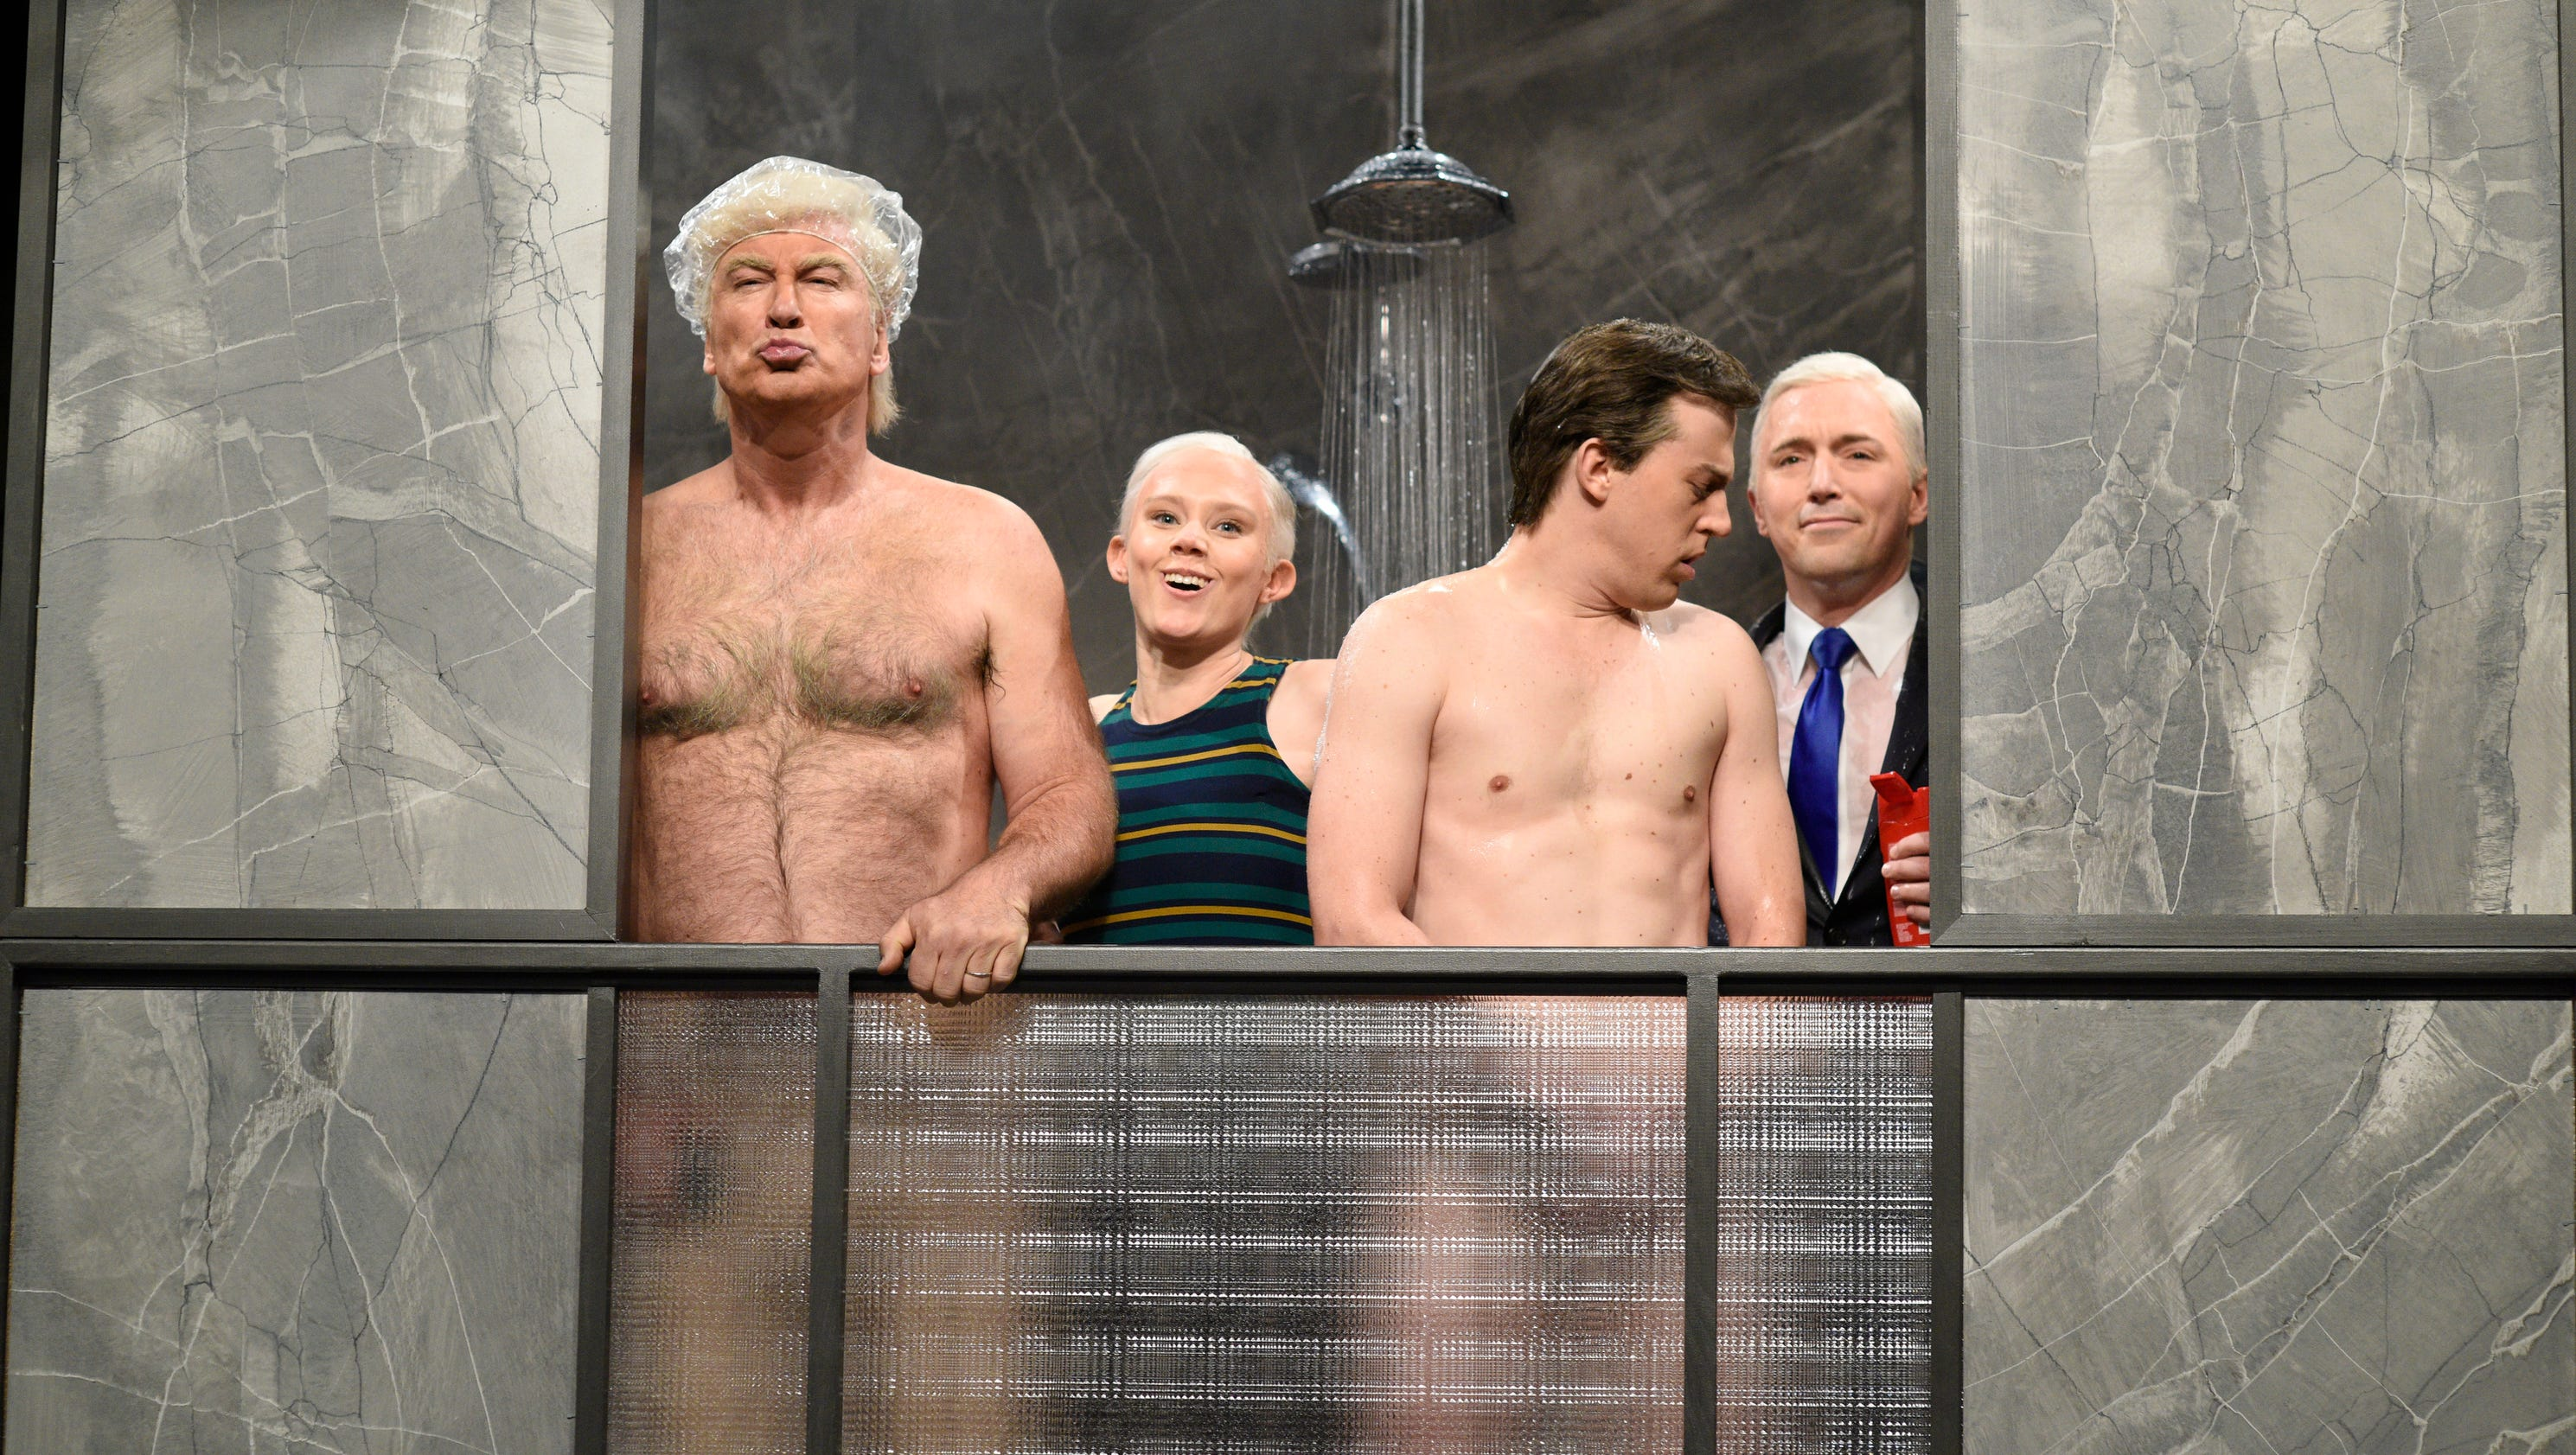 Alec Baldwin opens with Trump impression, Weinstein joke on 'Saturday Night Live'